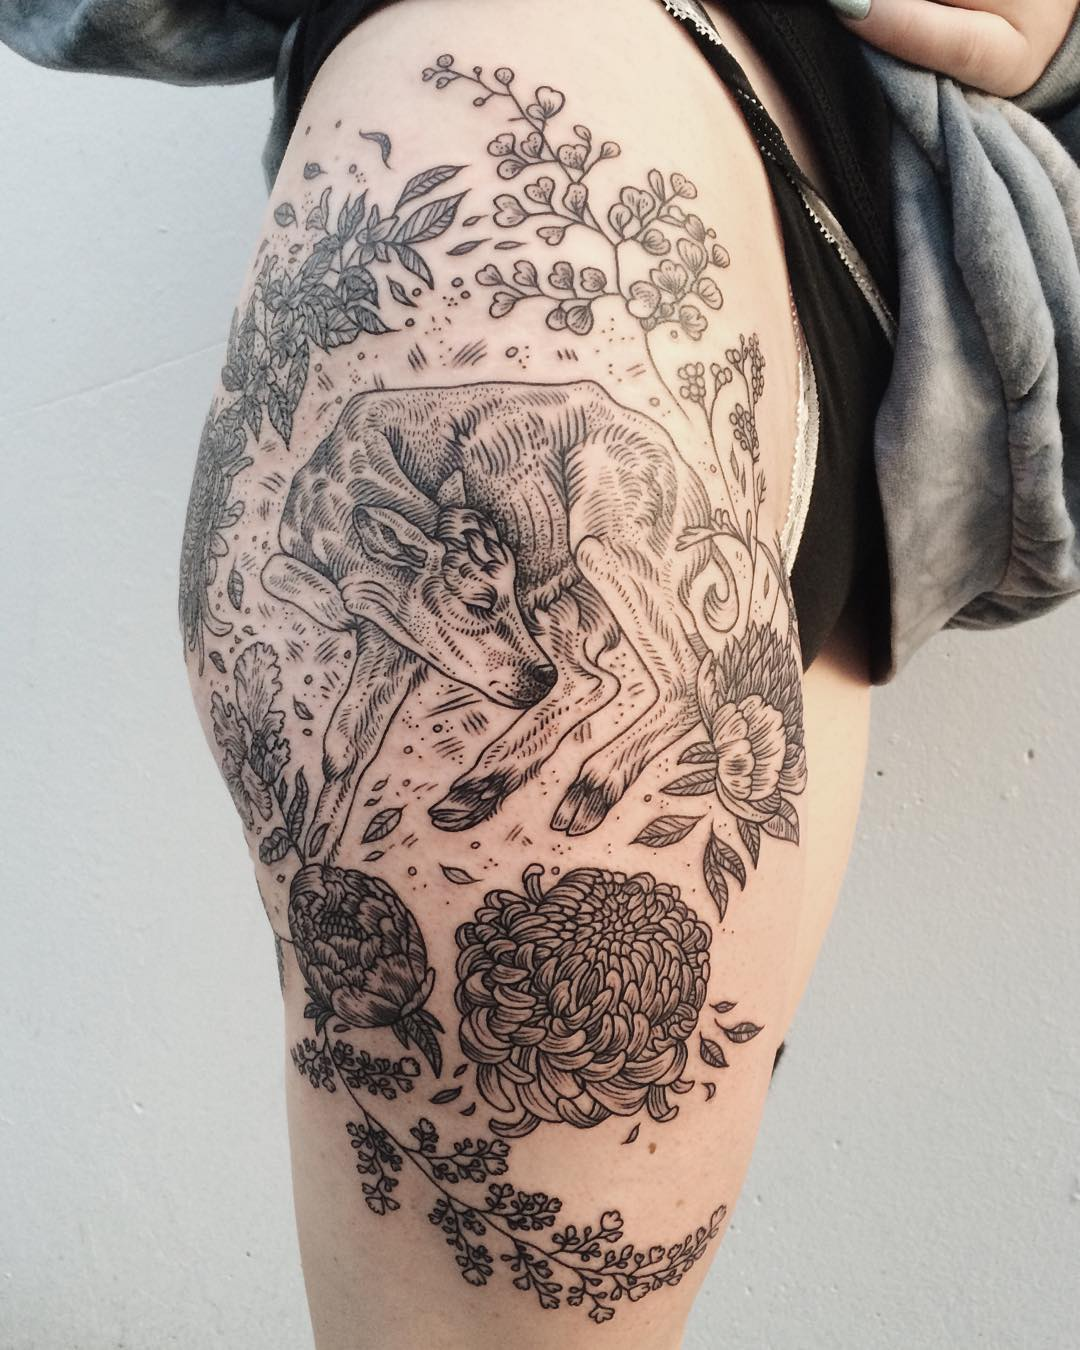 naturalistic-tattoos-vintage-pony-reinhardt-12